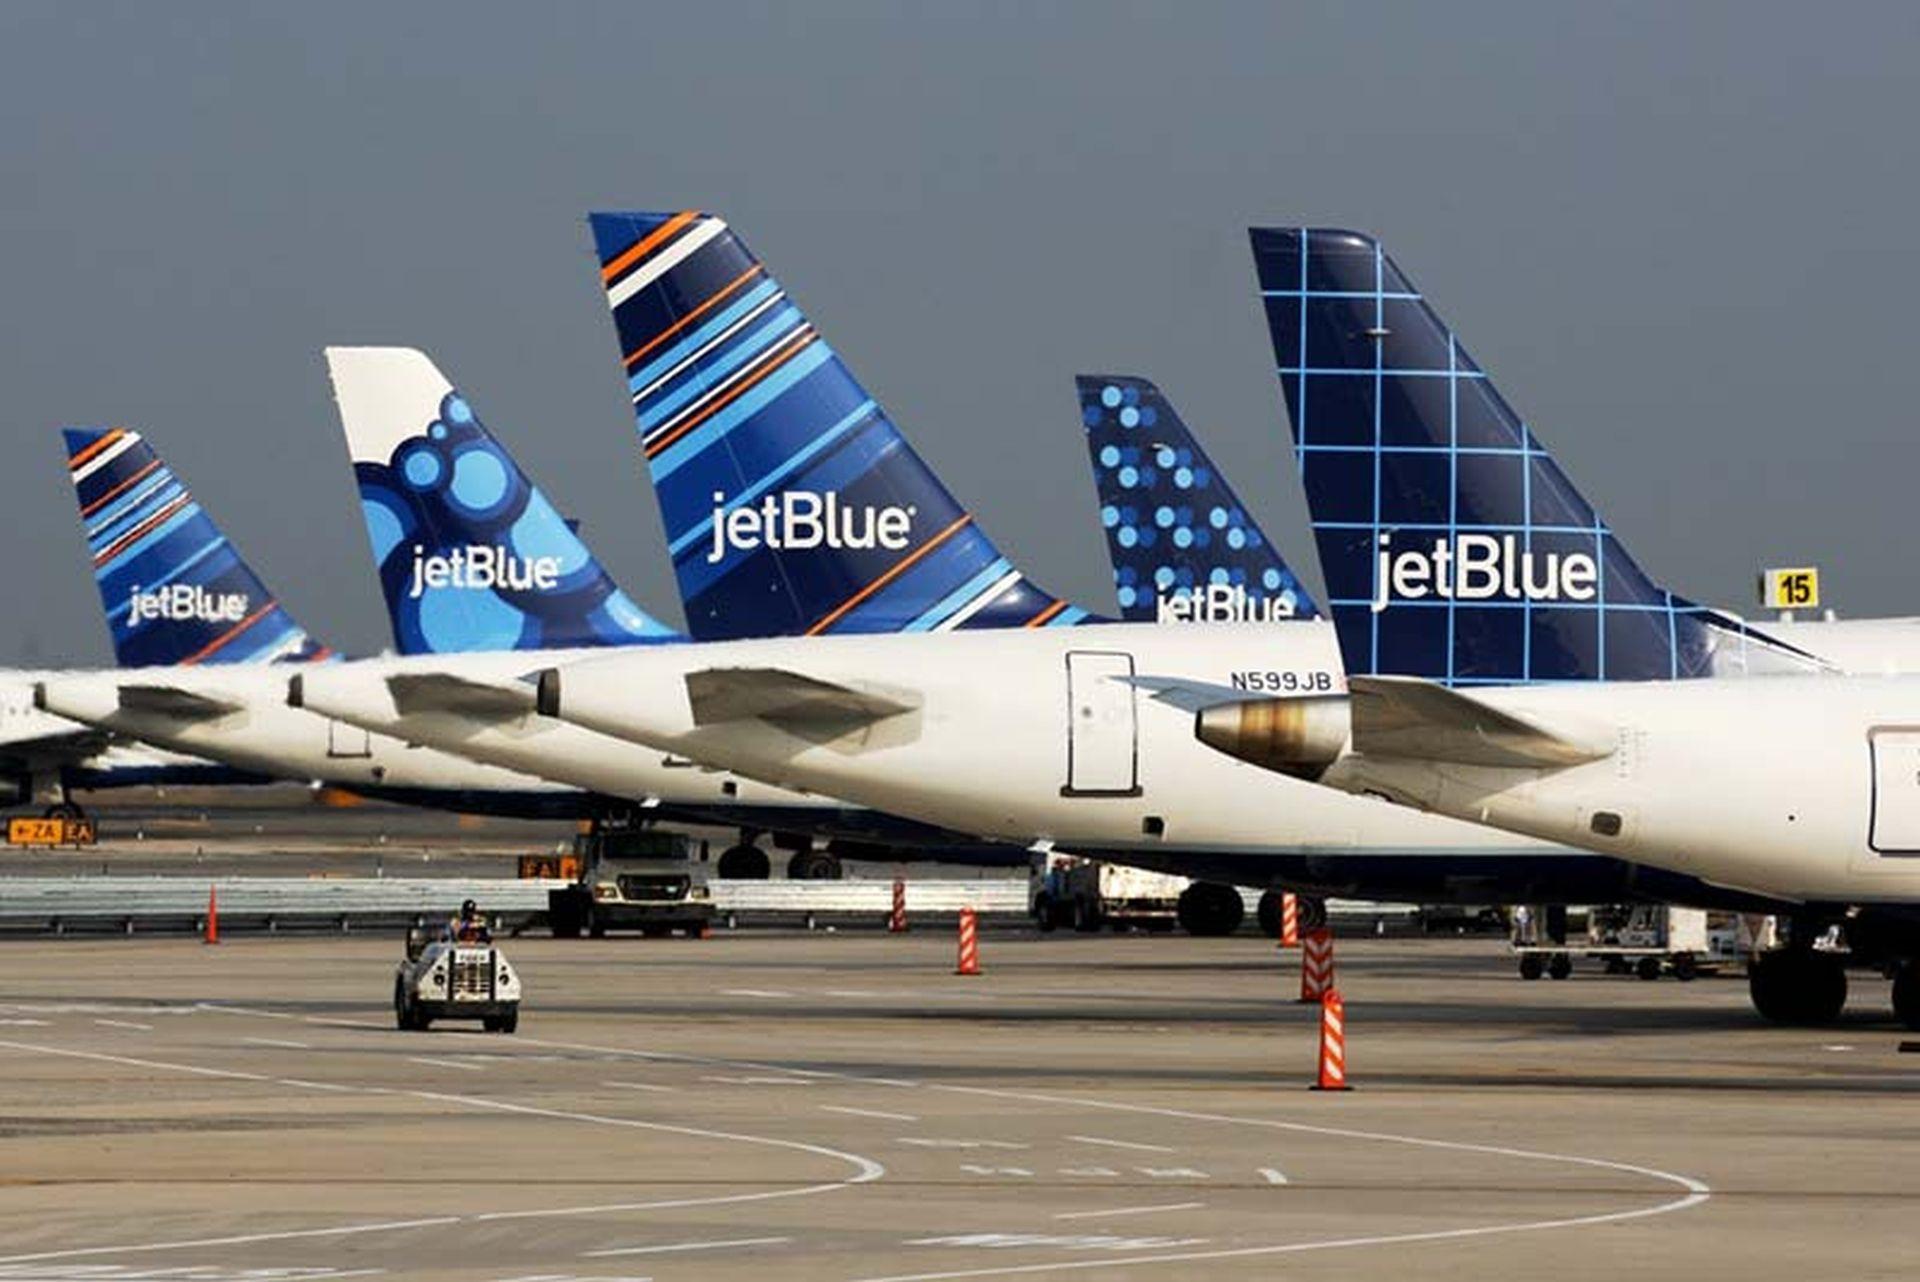 Letadla JetBlue v NewYorku. Foto: JetBlue